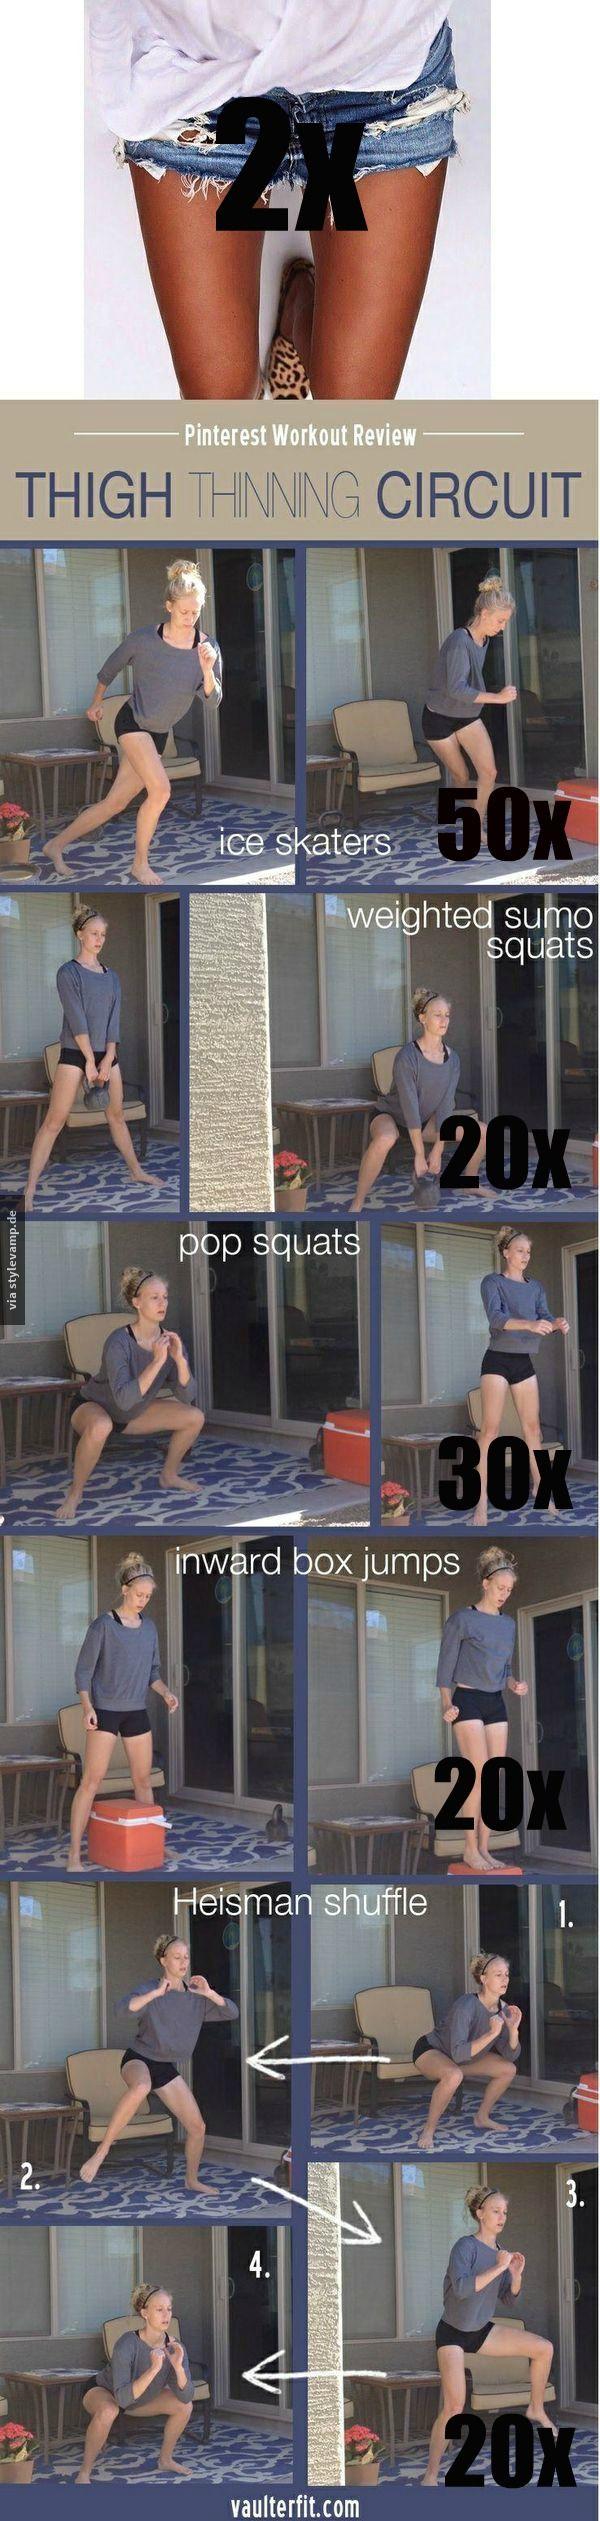 amazing thigh thinning workout!